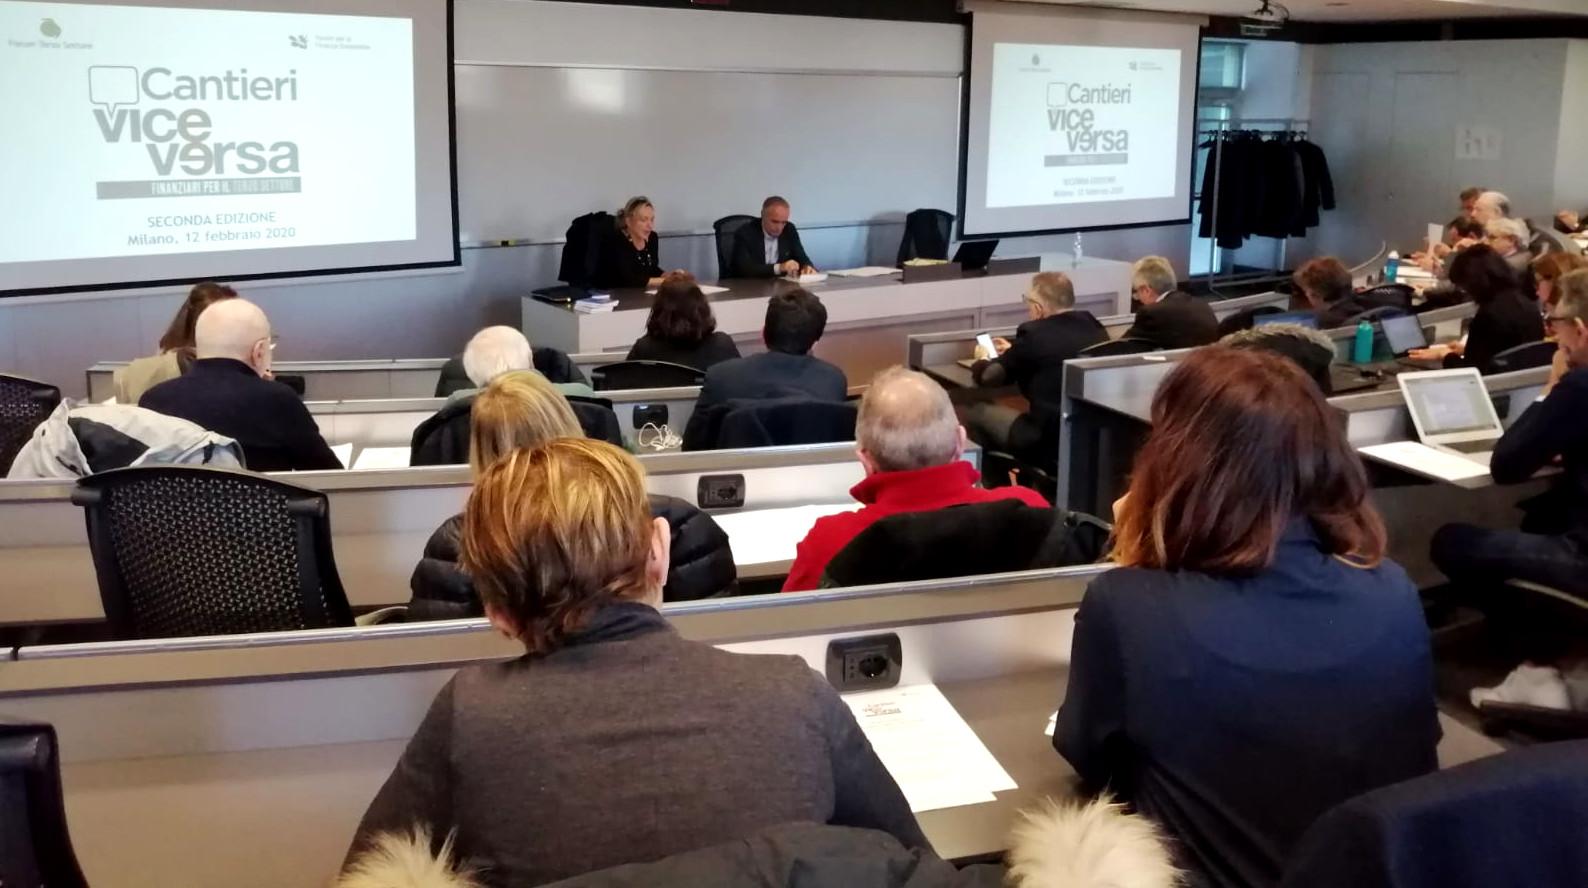 Conferenza stampa Cantieri ViceVersa 2.0 a Milano